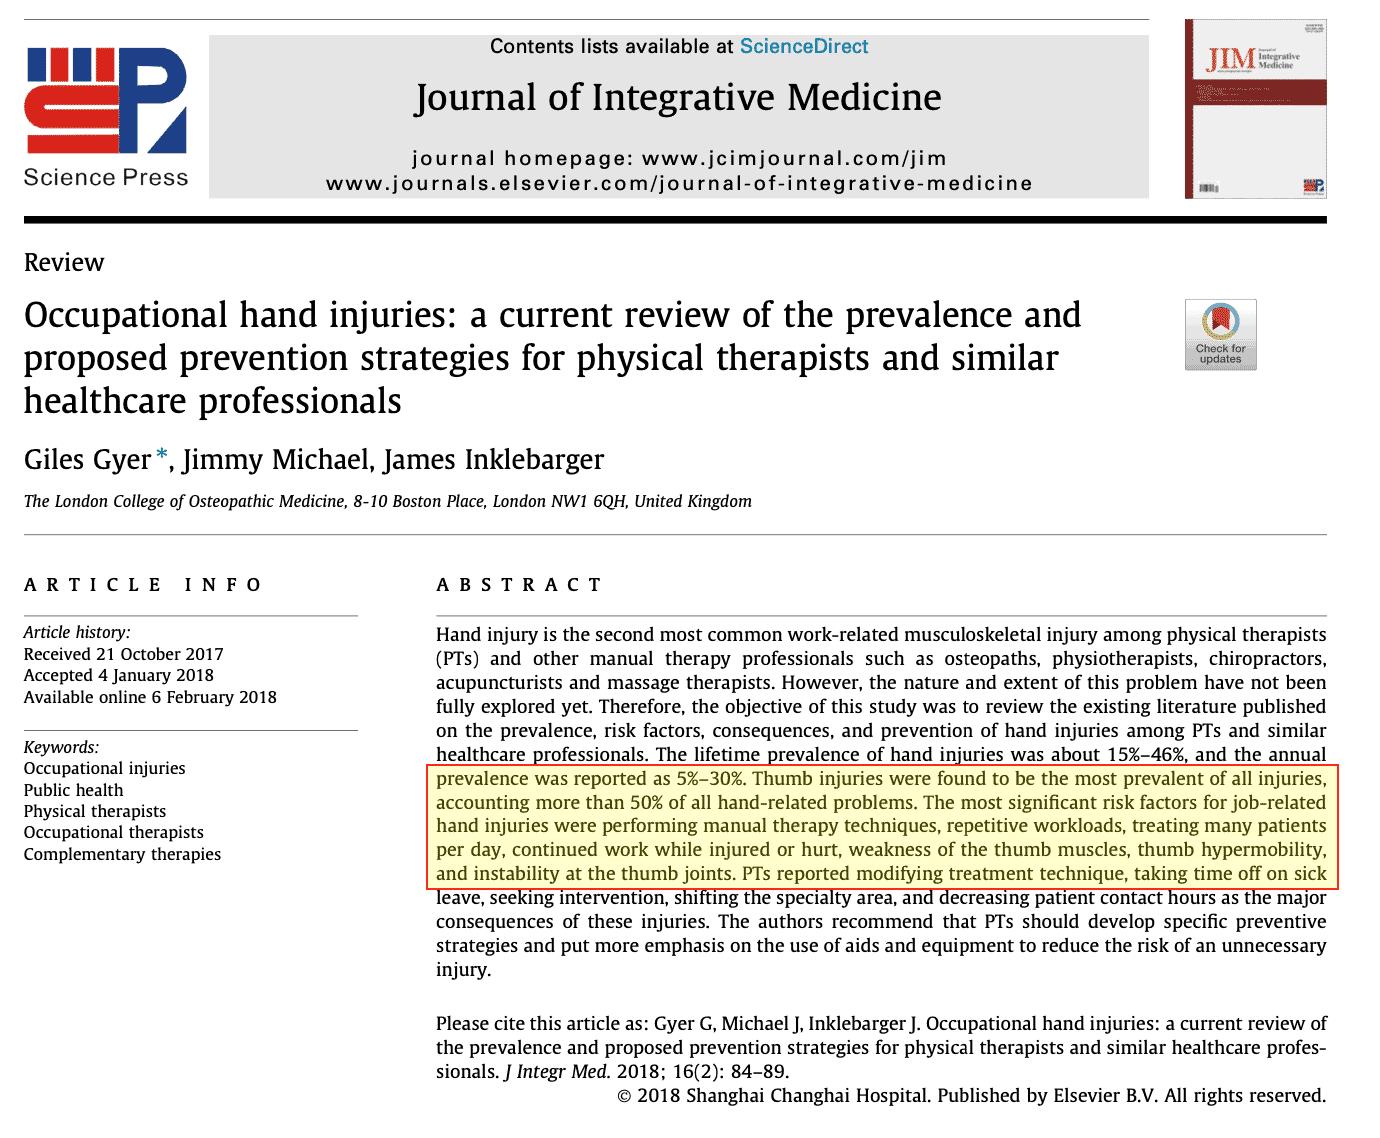 Studio Problemi mano Fisioterapisti Journal of Integrative Medicine